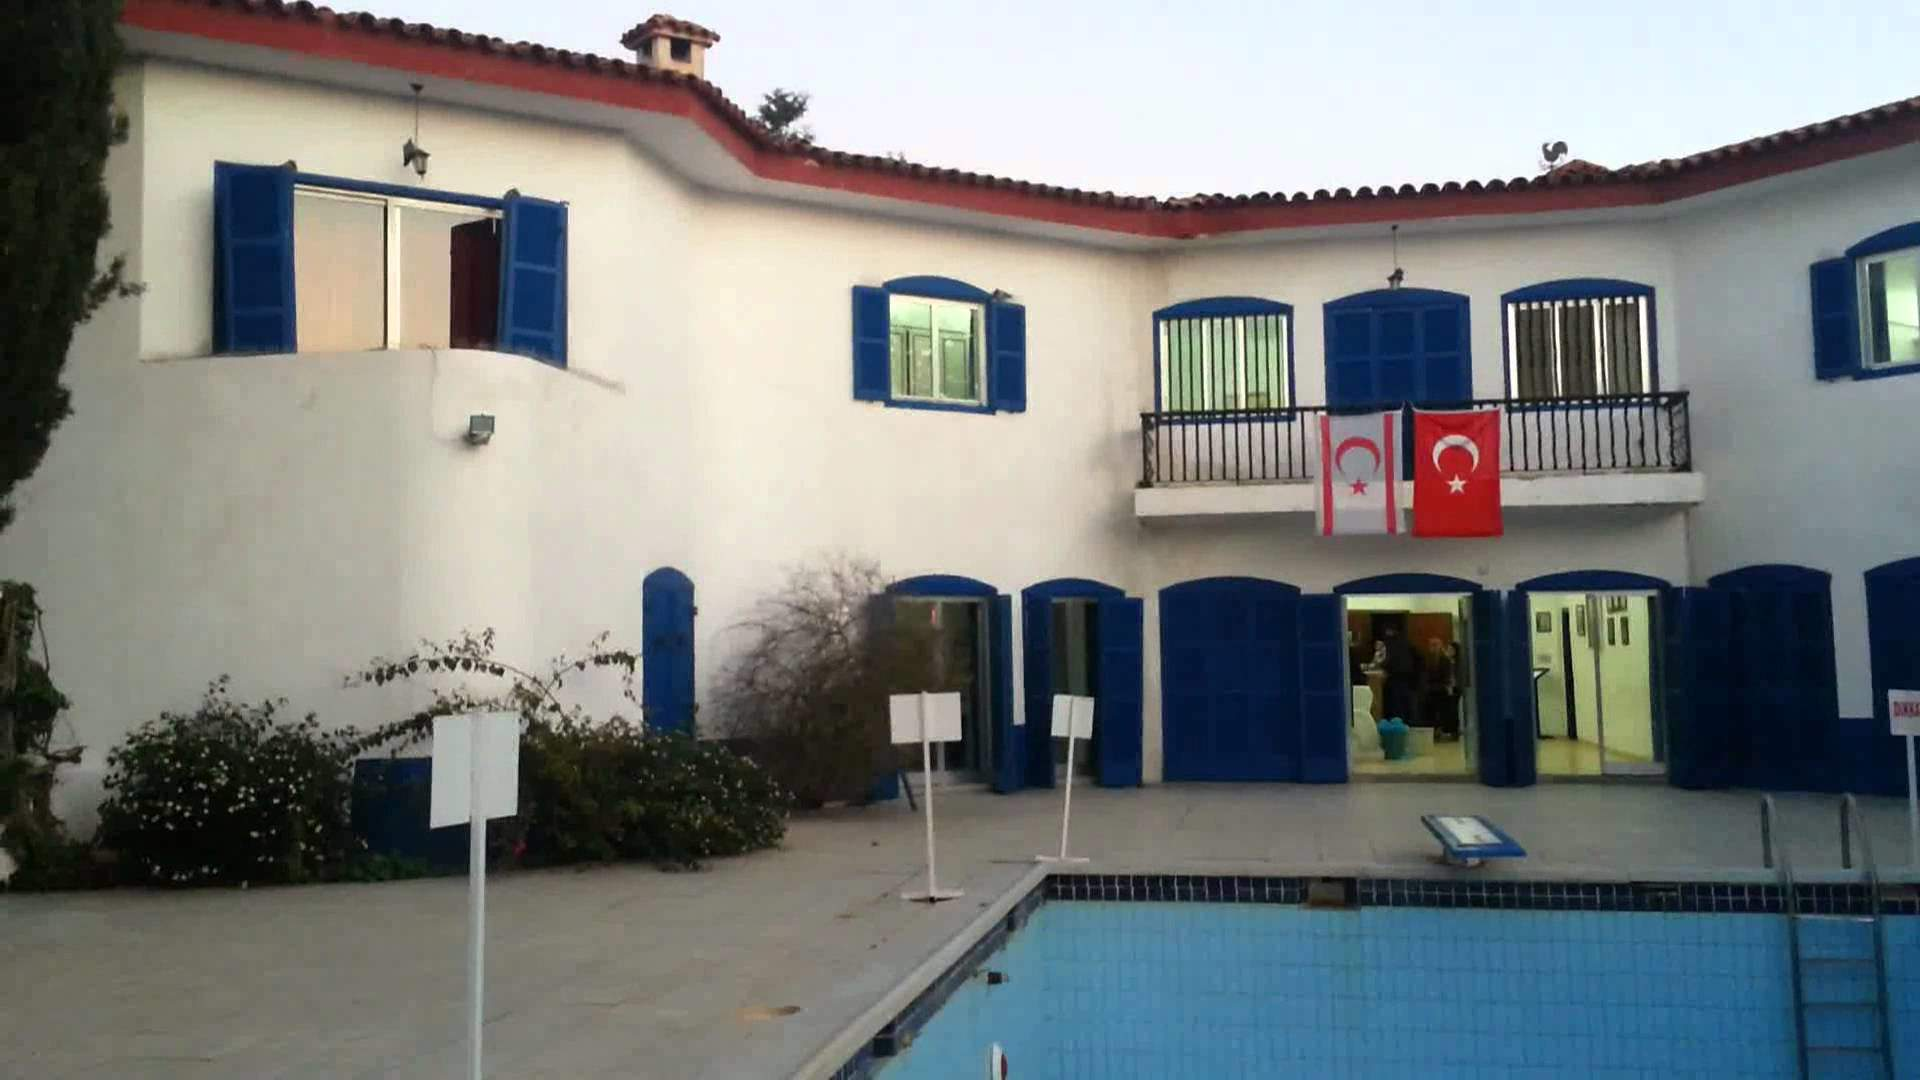 maxresdefault Kıbrıs Mavi Köşk